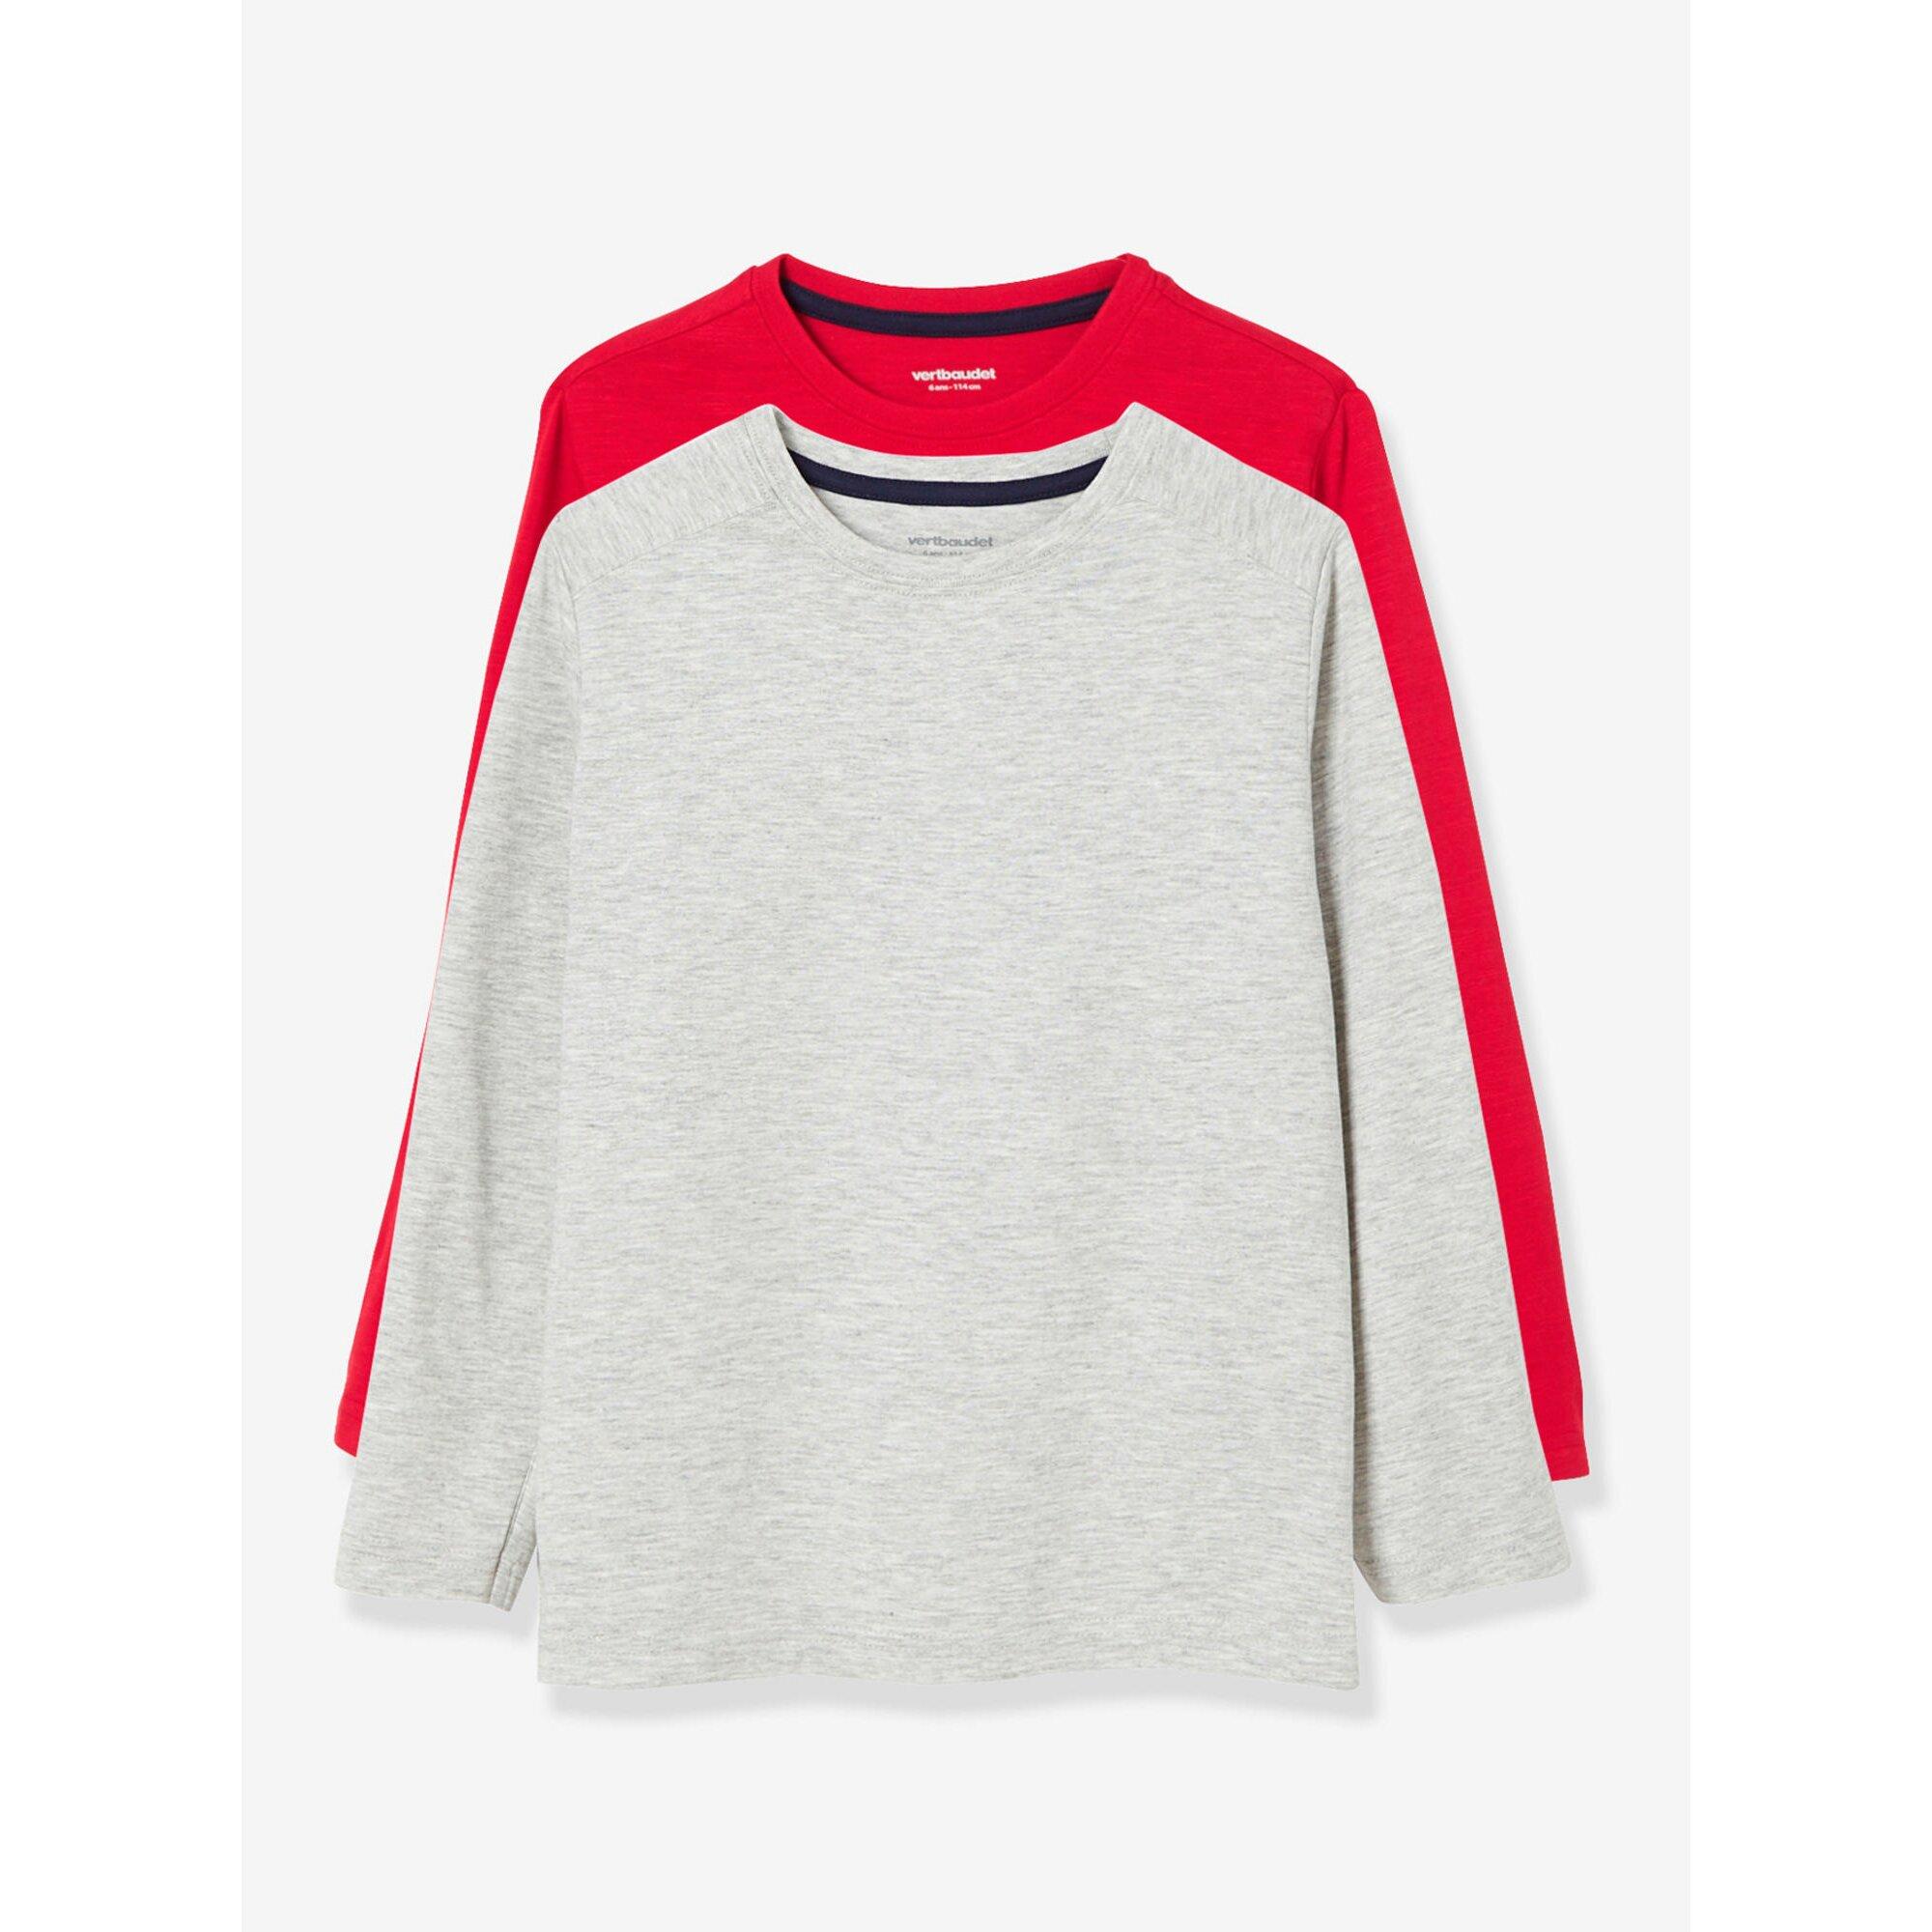 vertbaudet-2er-pack-shirts-fur-jungen